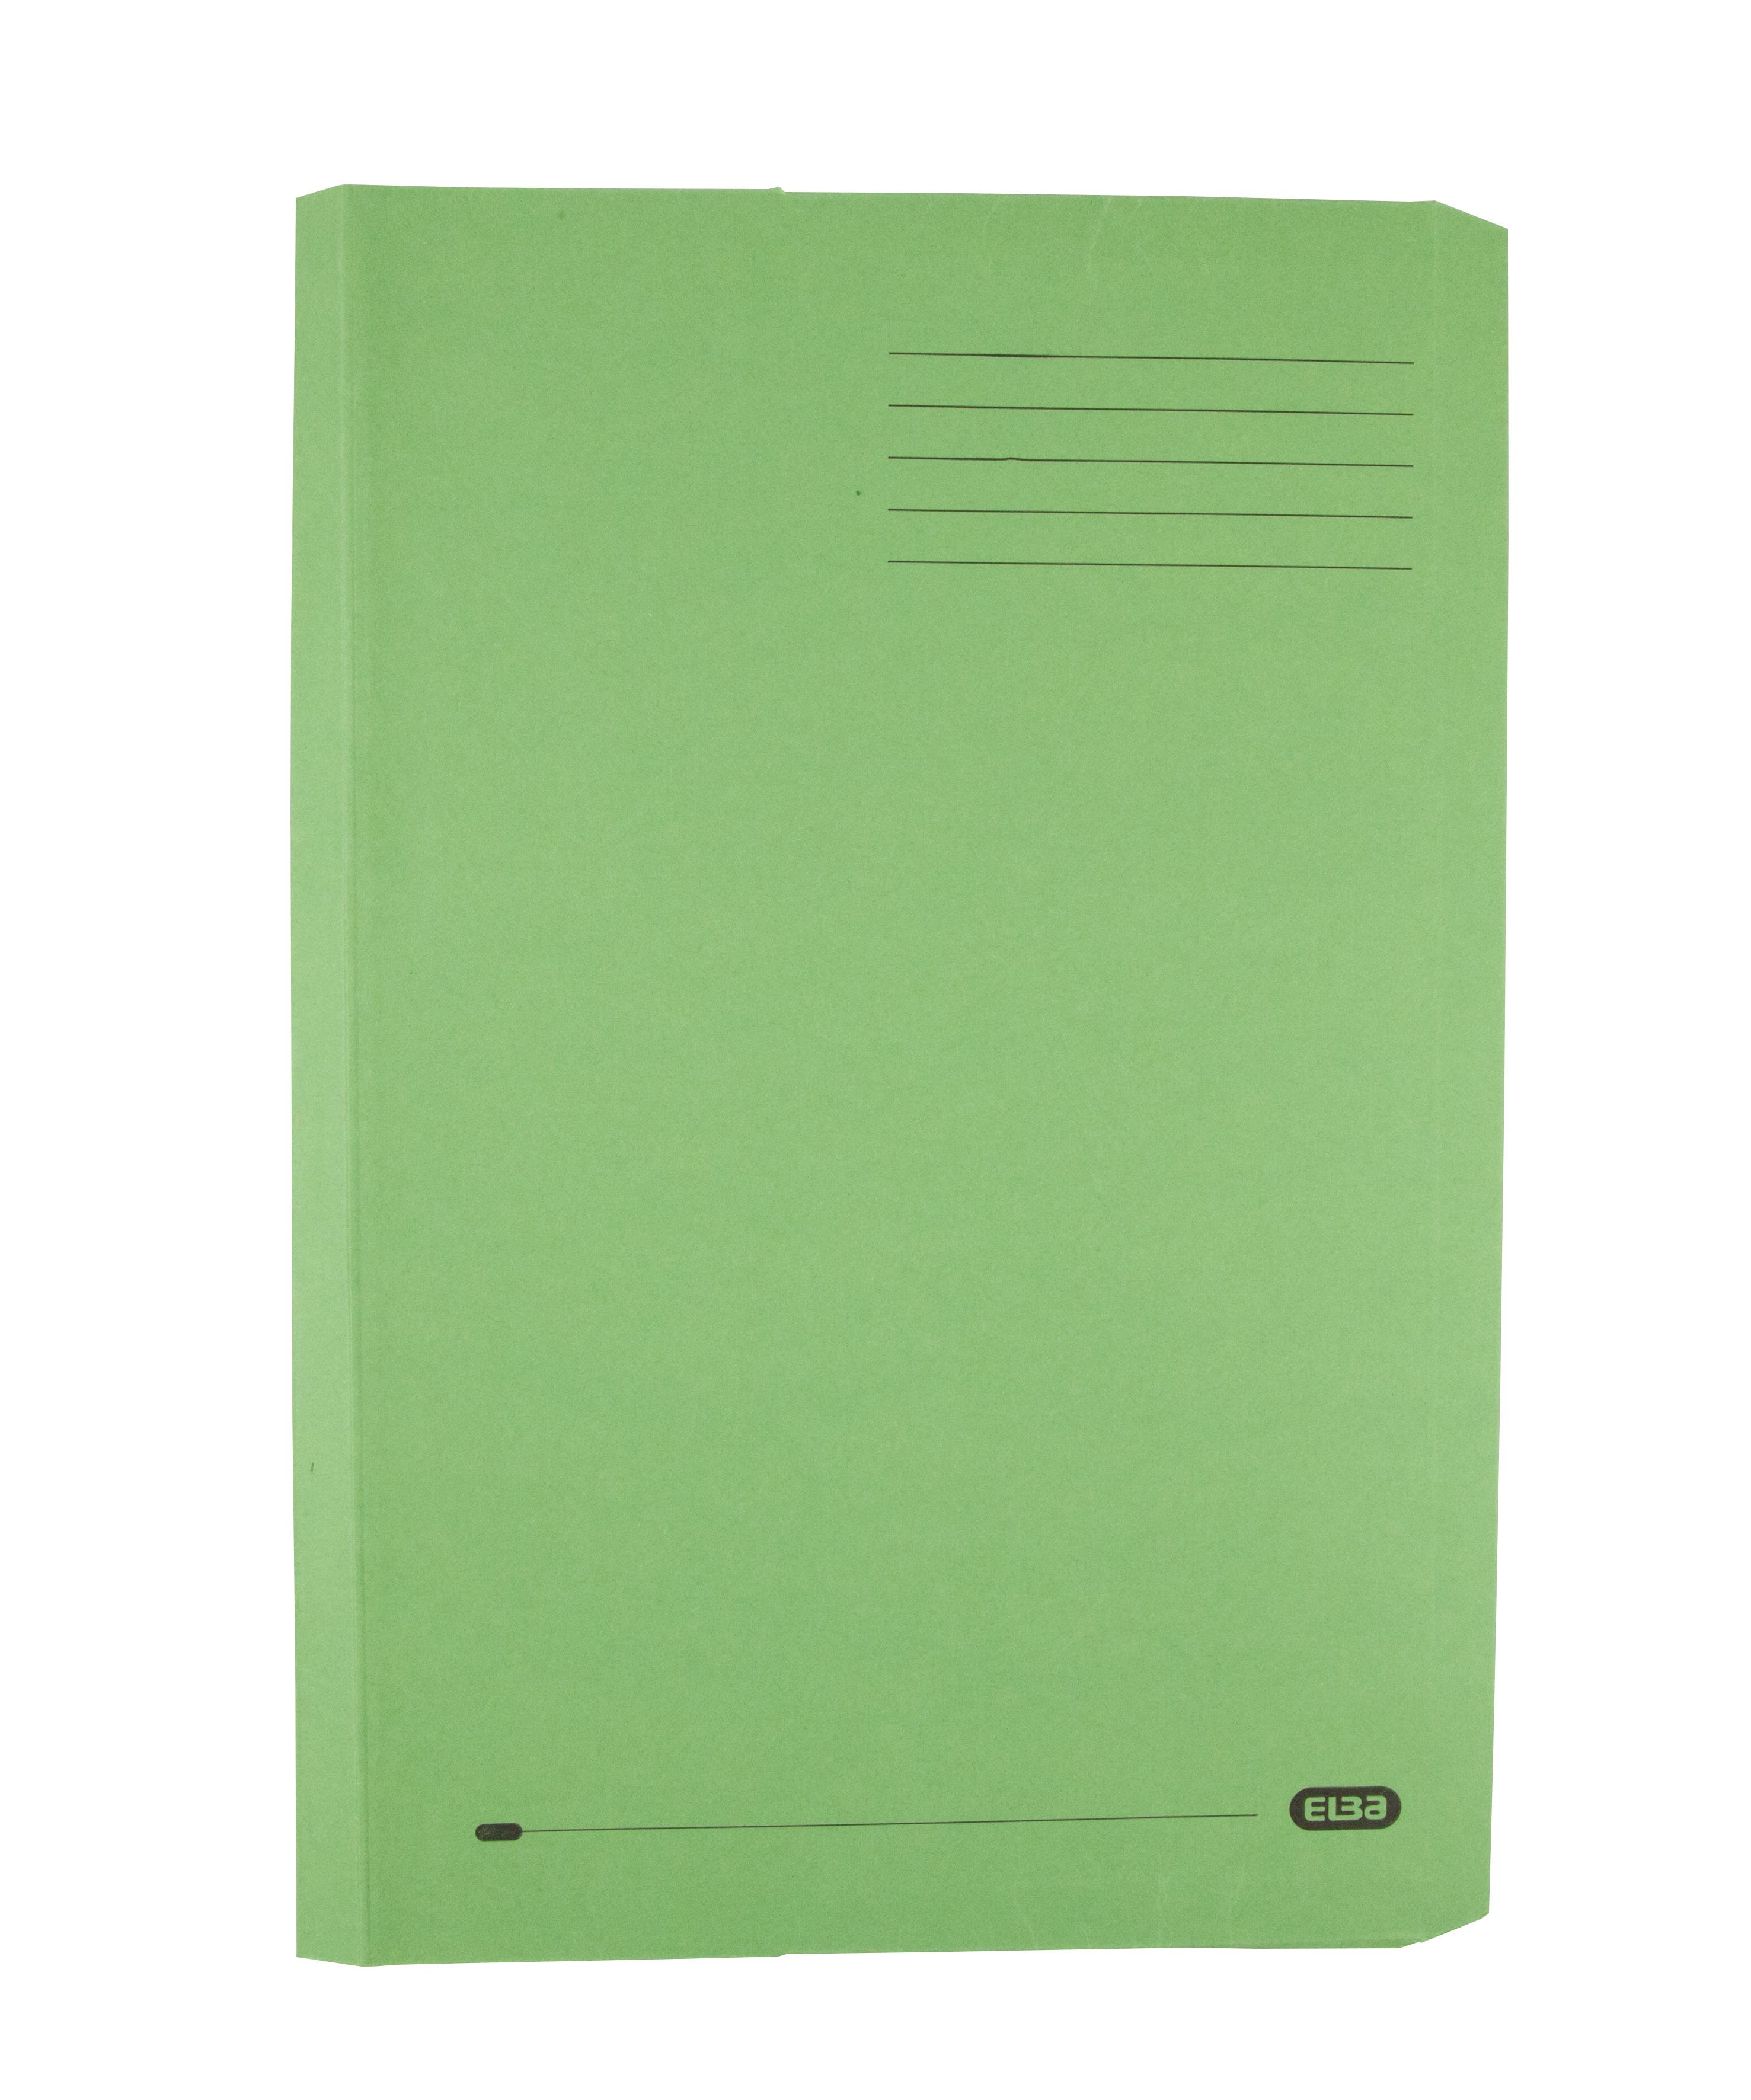 Elba Clifton Flat Bar Pocket (Rear) File 285gsm Capacity 50mm Foolscap Green Ref 100090179 [Pack 25]